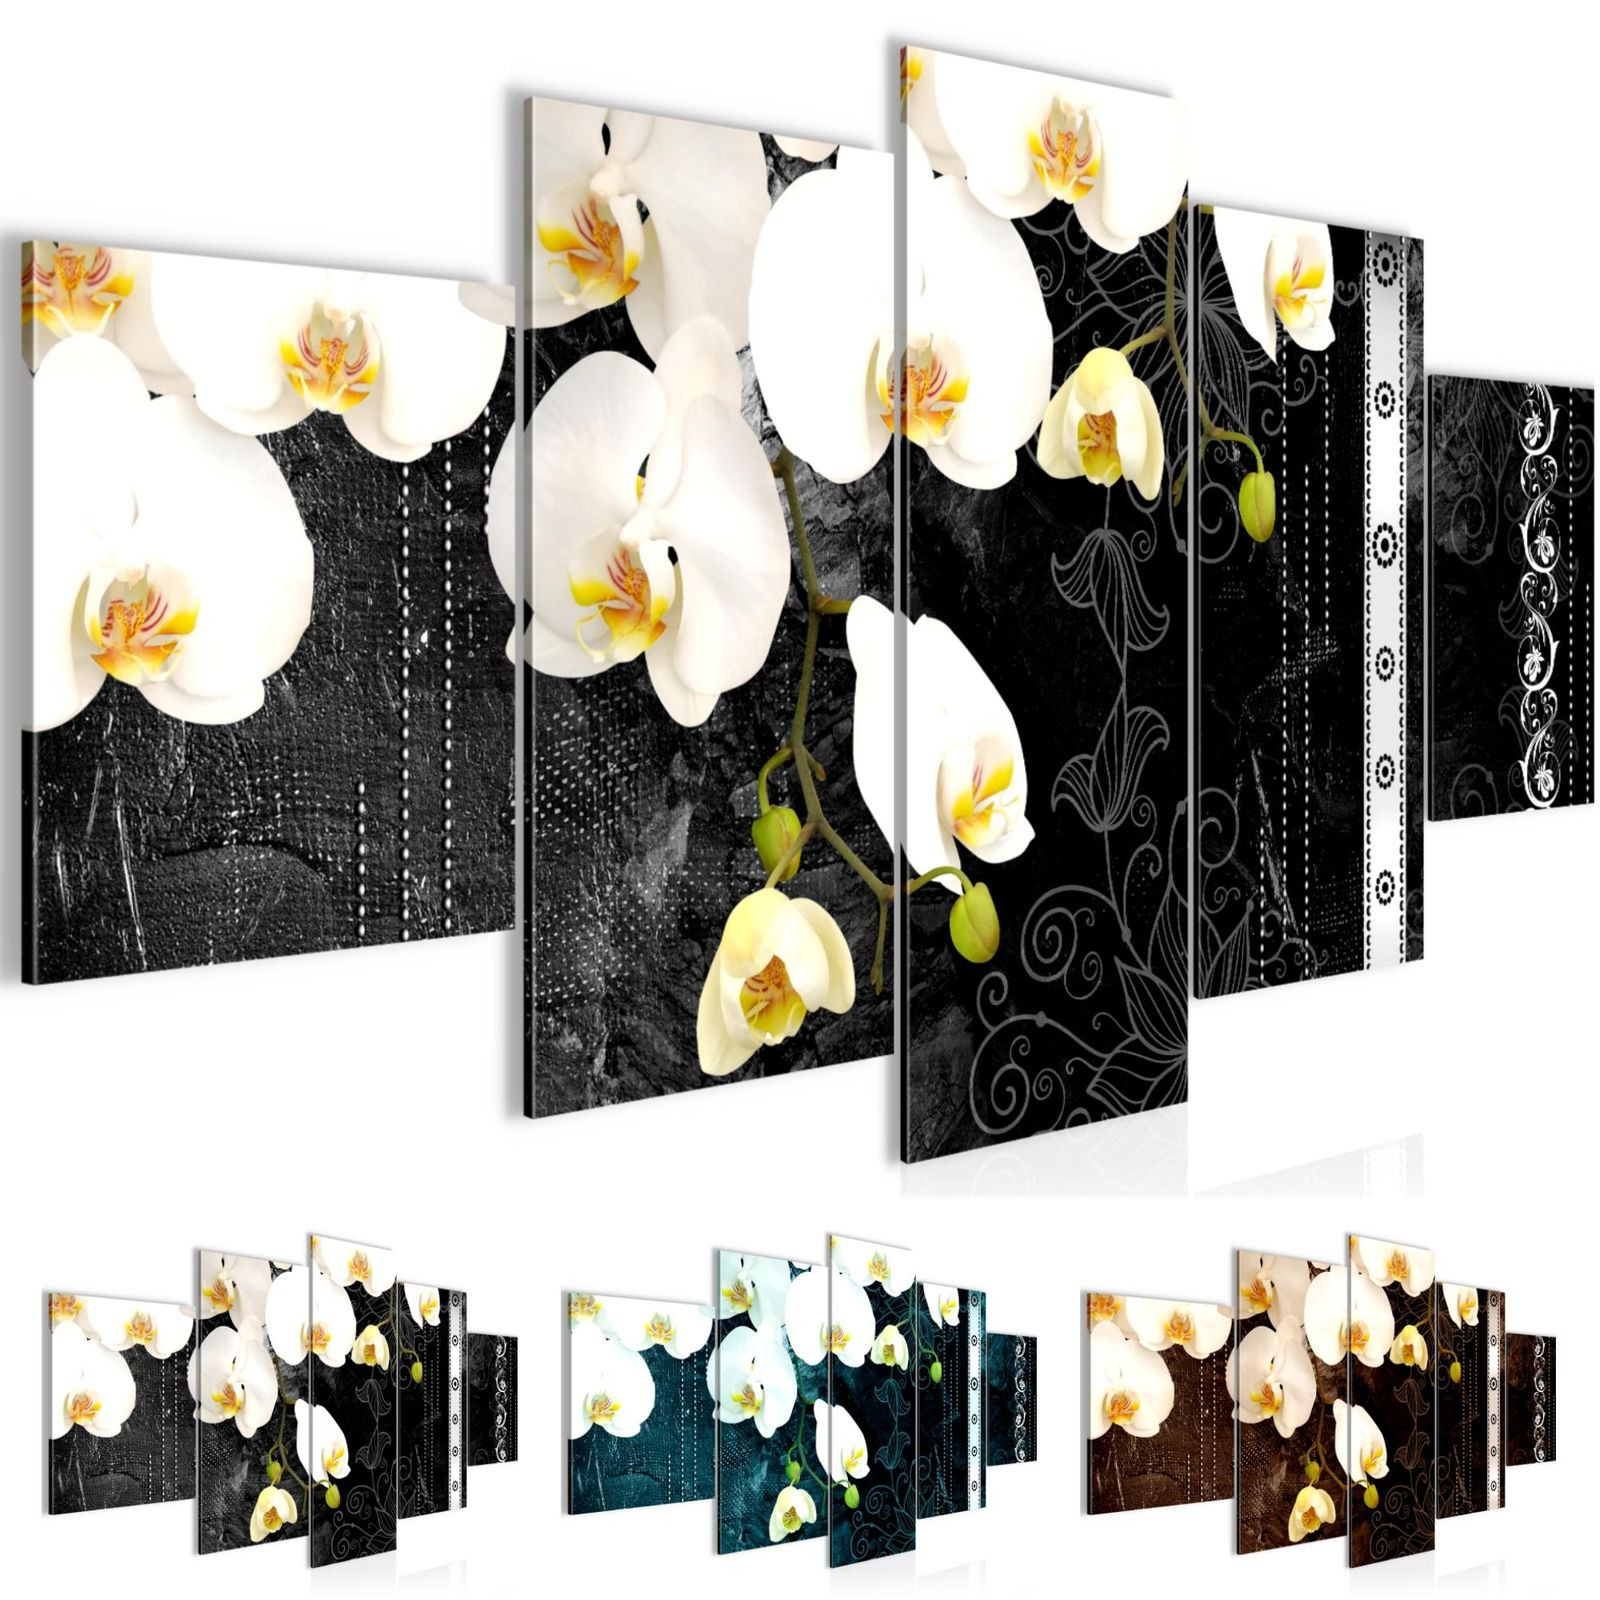 Wandbilder Blumen Orchidee Vlies Leinwand Bild Xxl Bilder Kunstdruck p